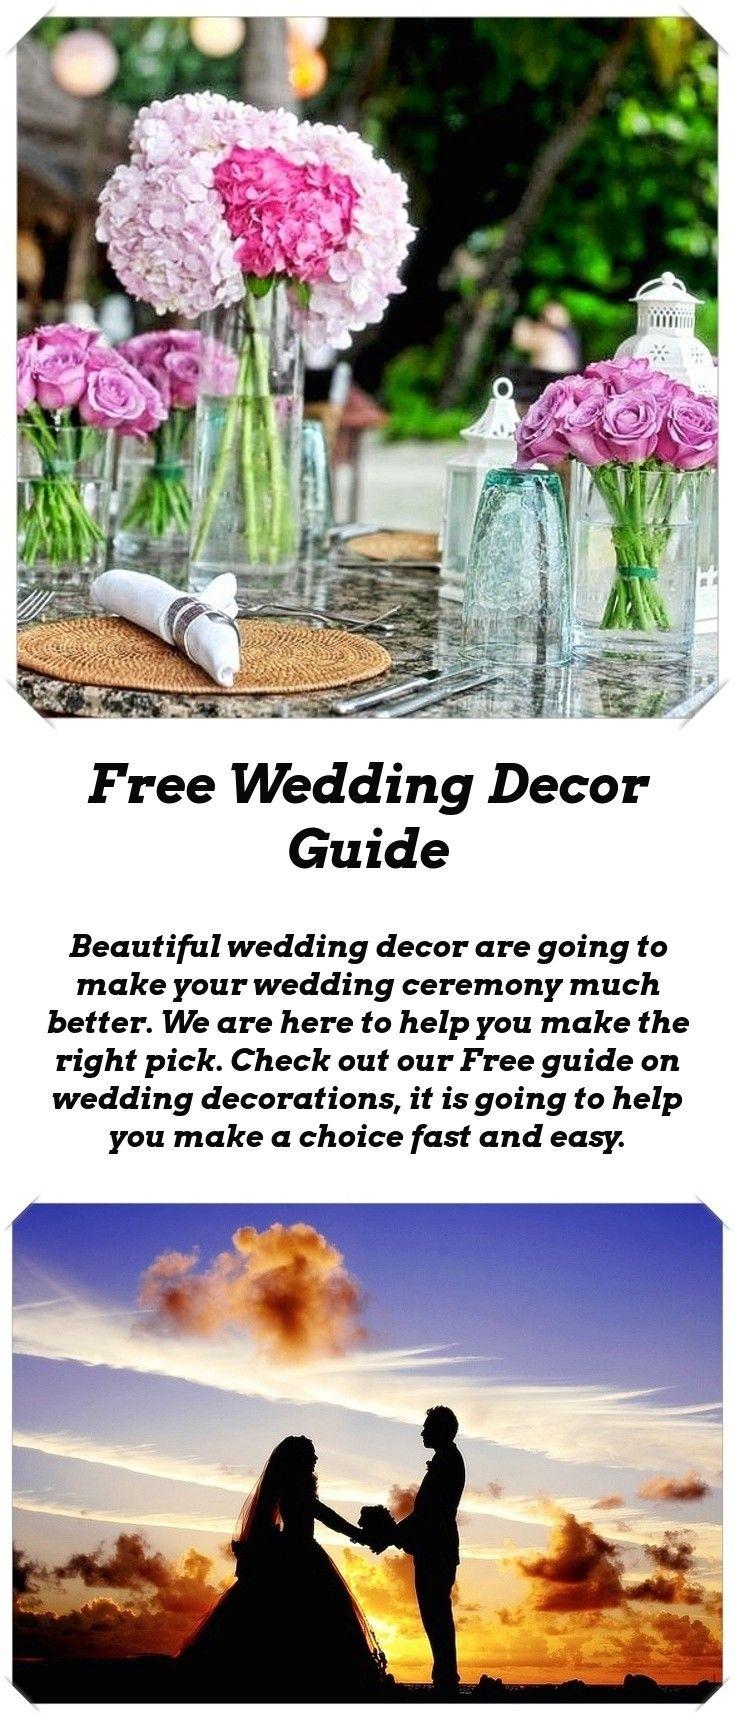 Wedding decorations to make  Decor For Wedding  Wedding tables Table decorations and Wedding